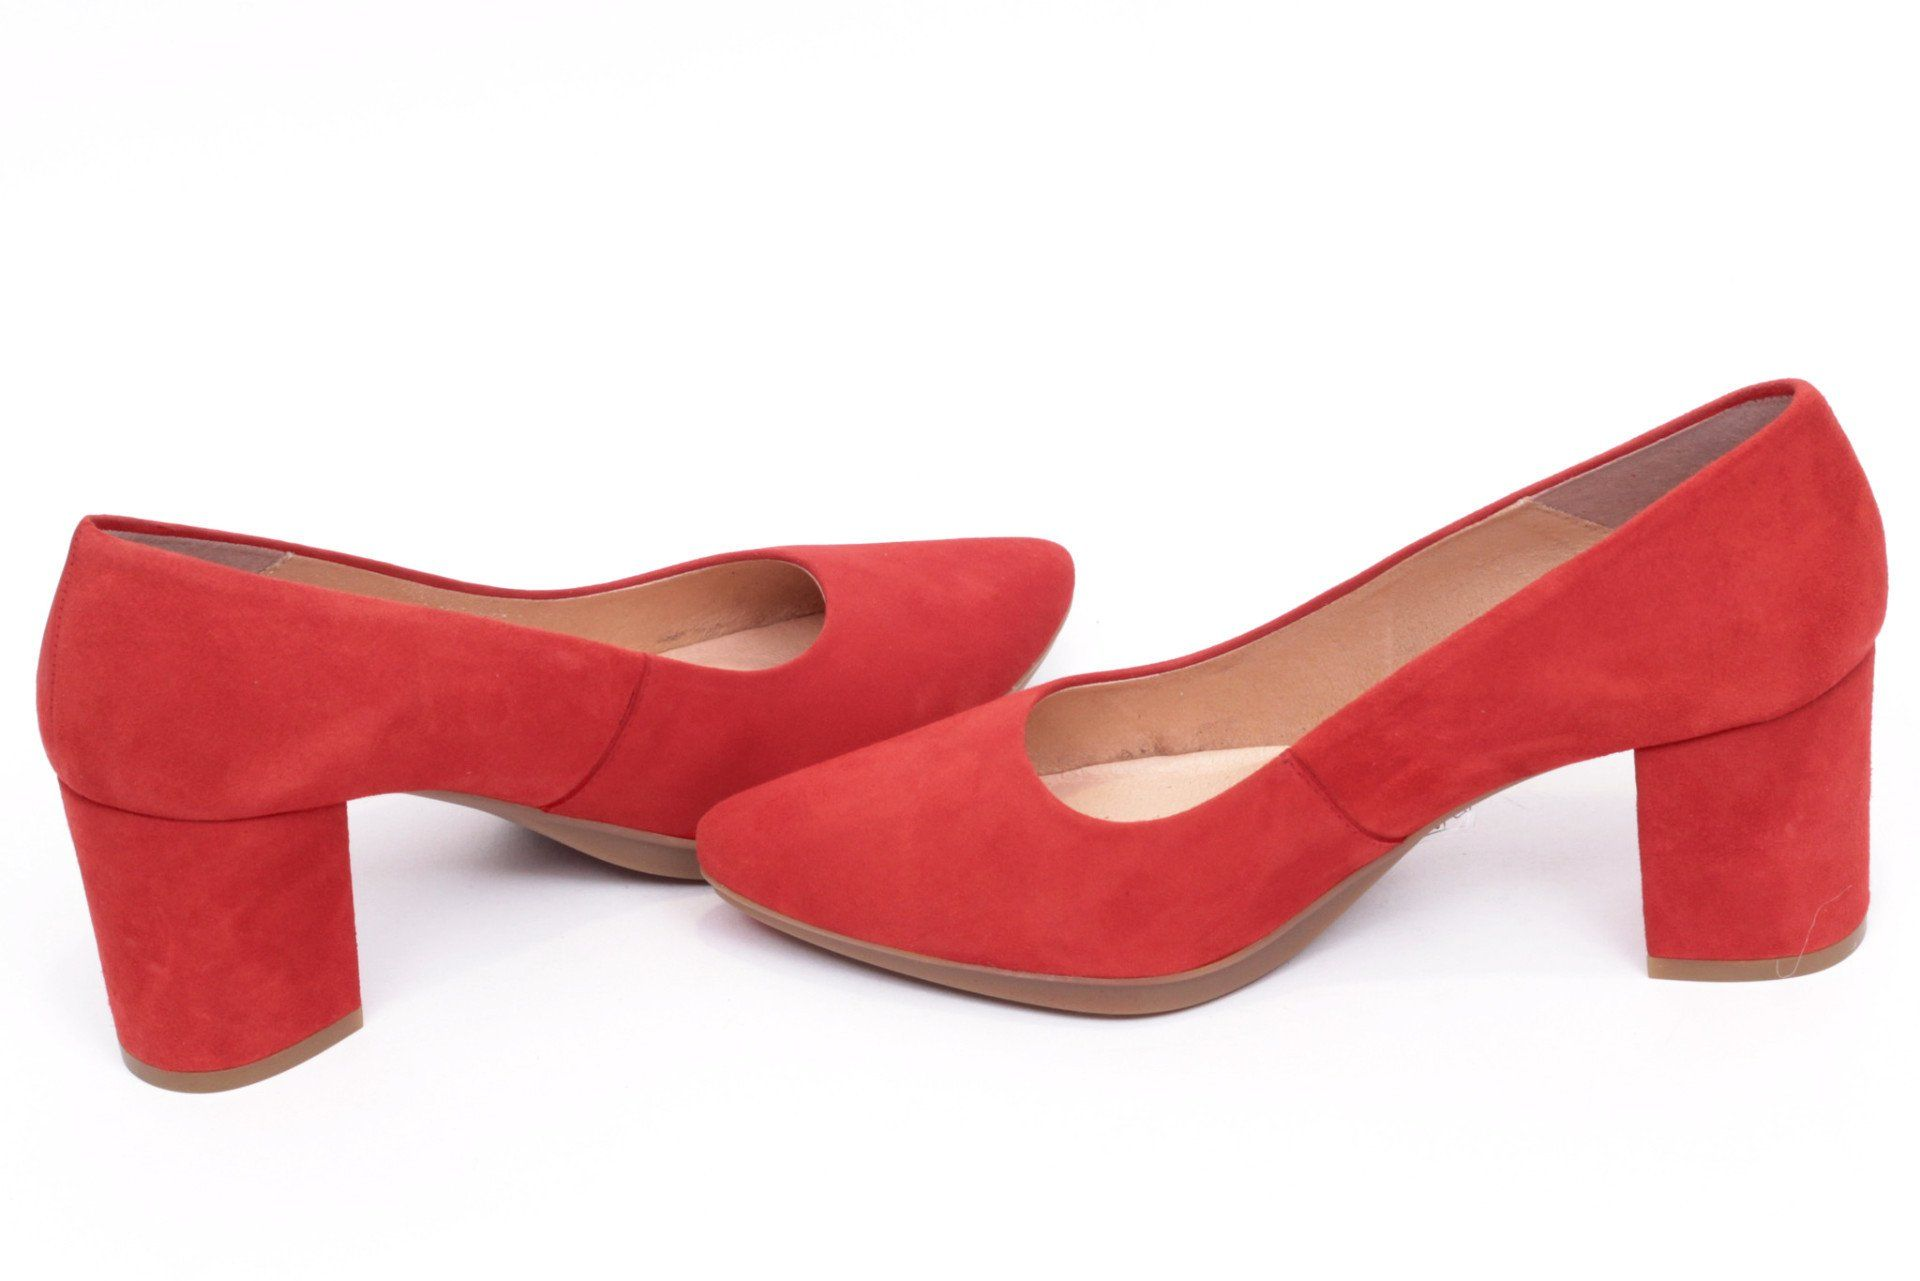 Rojo Mimao Salón Urban Carmesí S Zapatos Pinterest De rRnRqEFwH